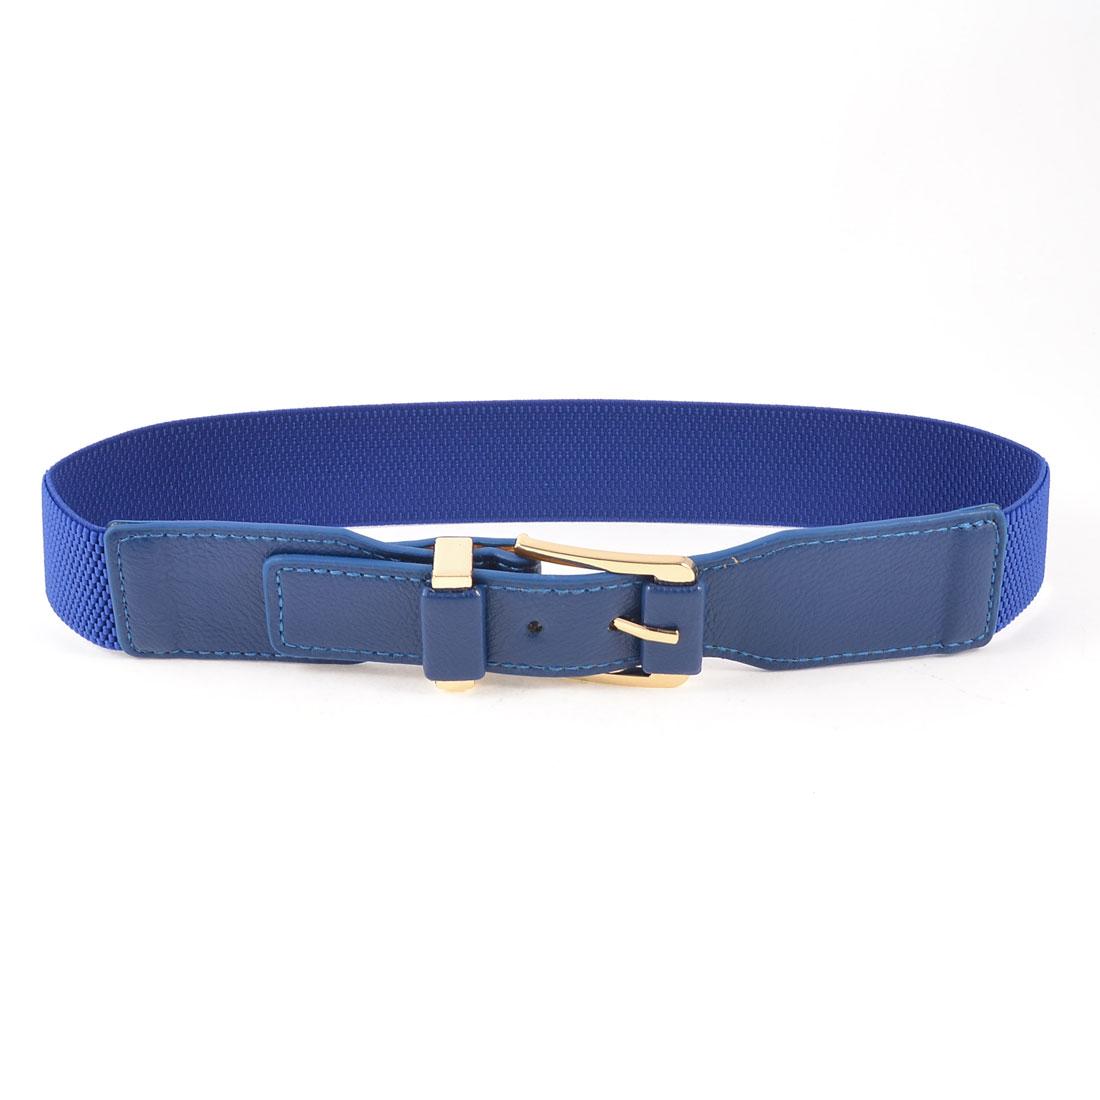 Gold Tone Metallic Single Prong Buckle Blue Cinch Belt for Ladies